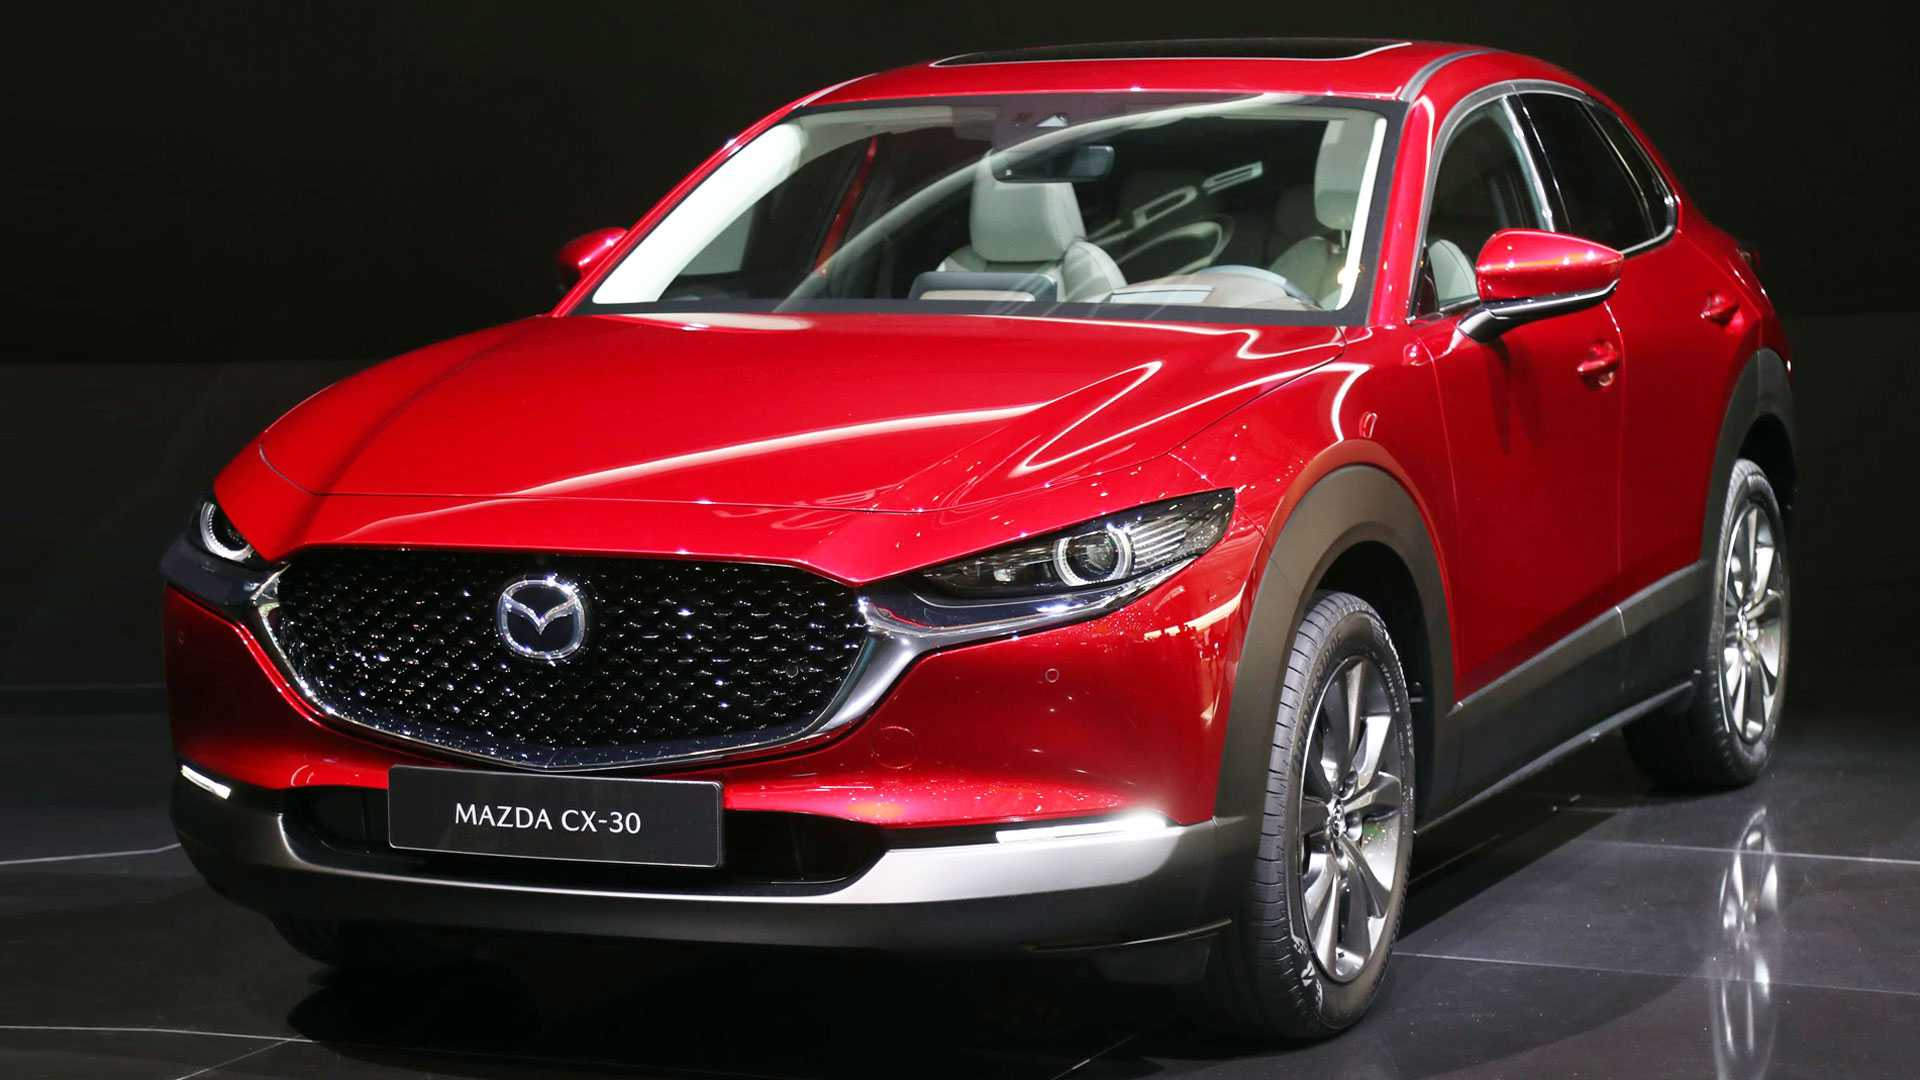 2020 Mazda CX-30 Starts At $21,900, Tops Out At Nearly $30,000